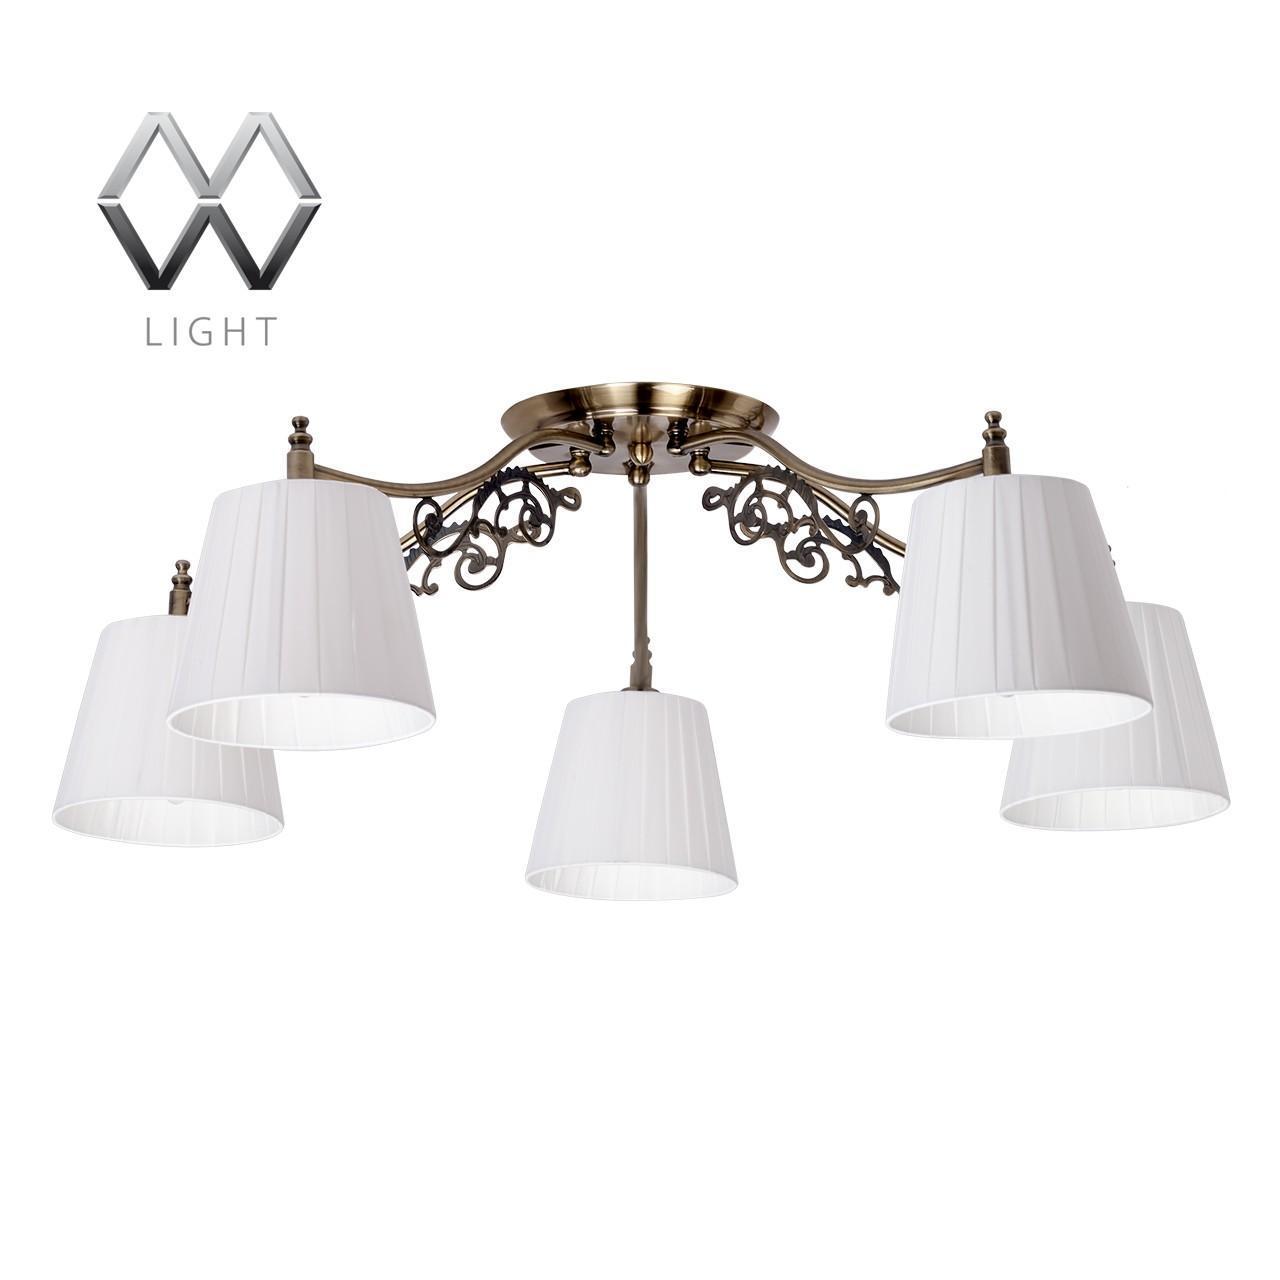 Люстра MW-Light Моника 372011105 потолочная люстра потолочная mw light мечта 297012905